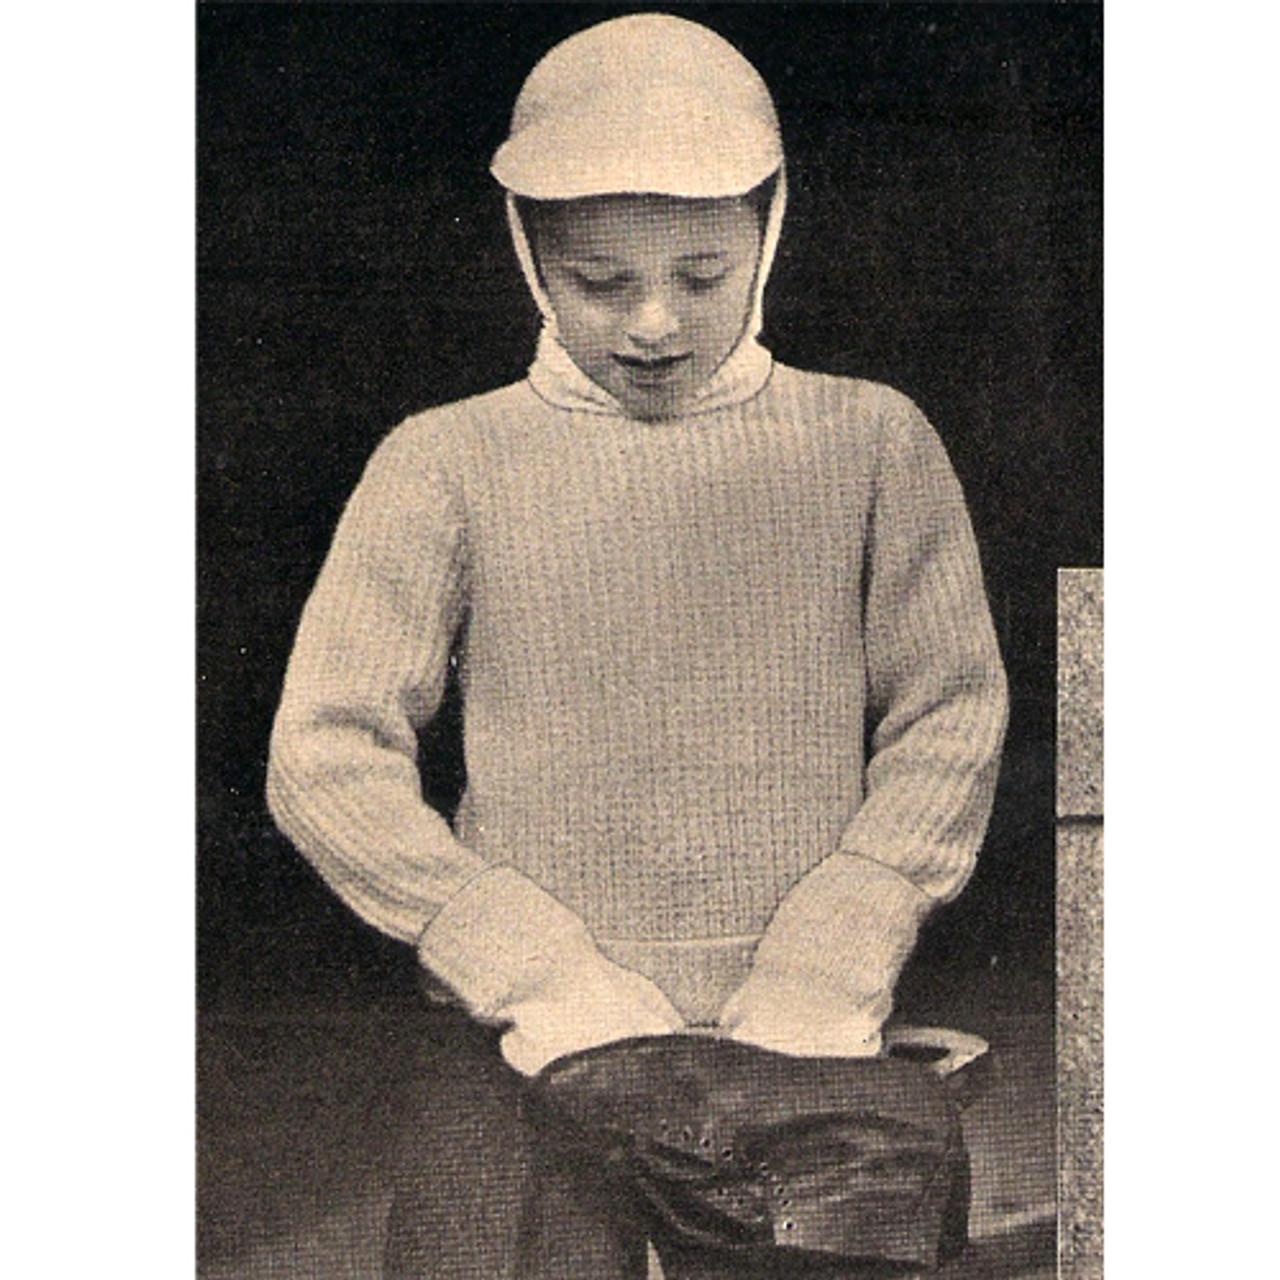 Boys Vintage Skating Outfit Pattern